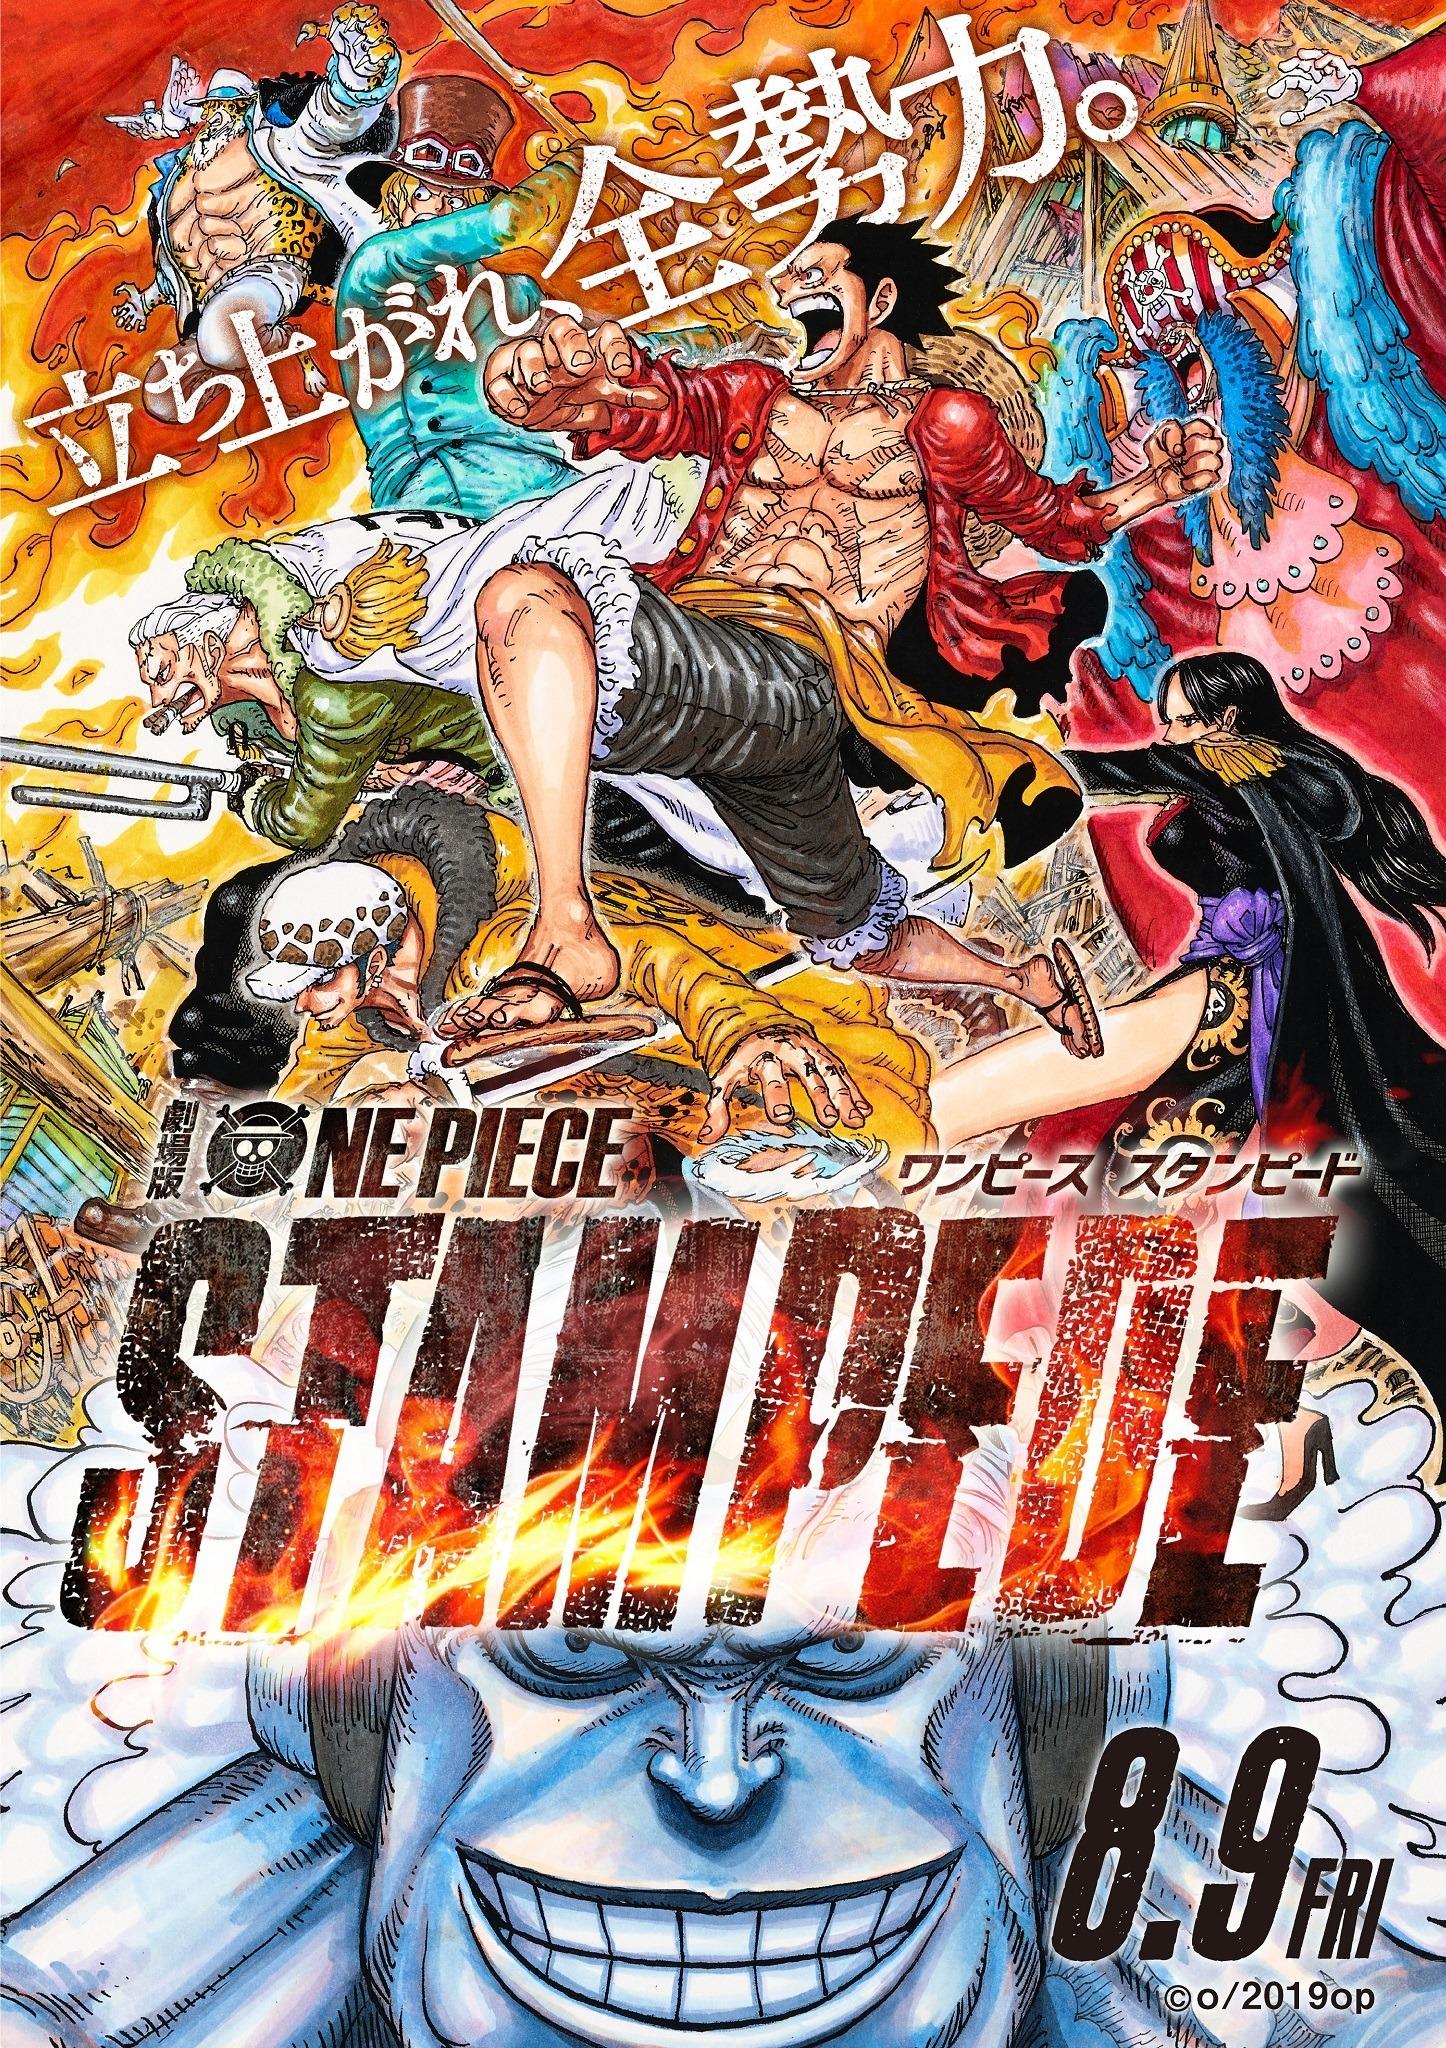 One Piece: Stampede | One Piece Wiki | Fandom